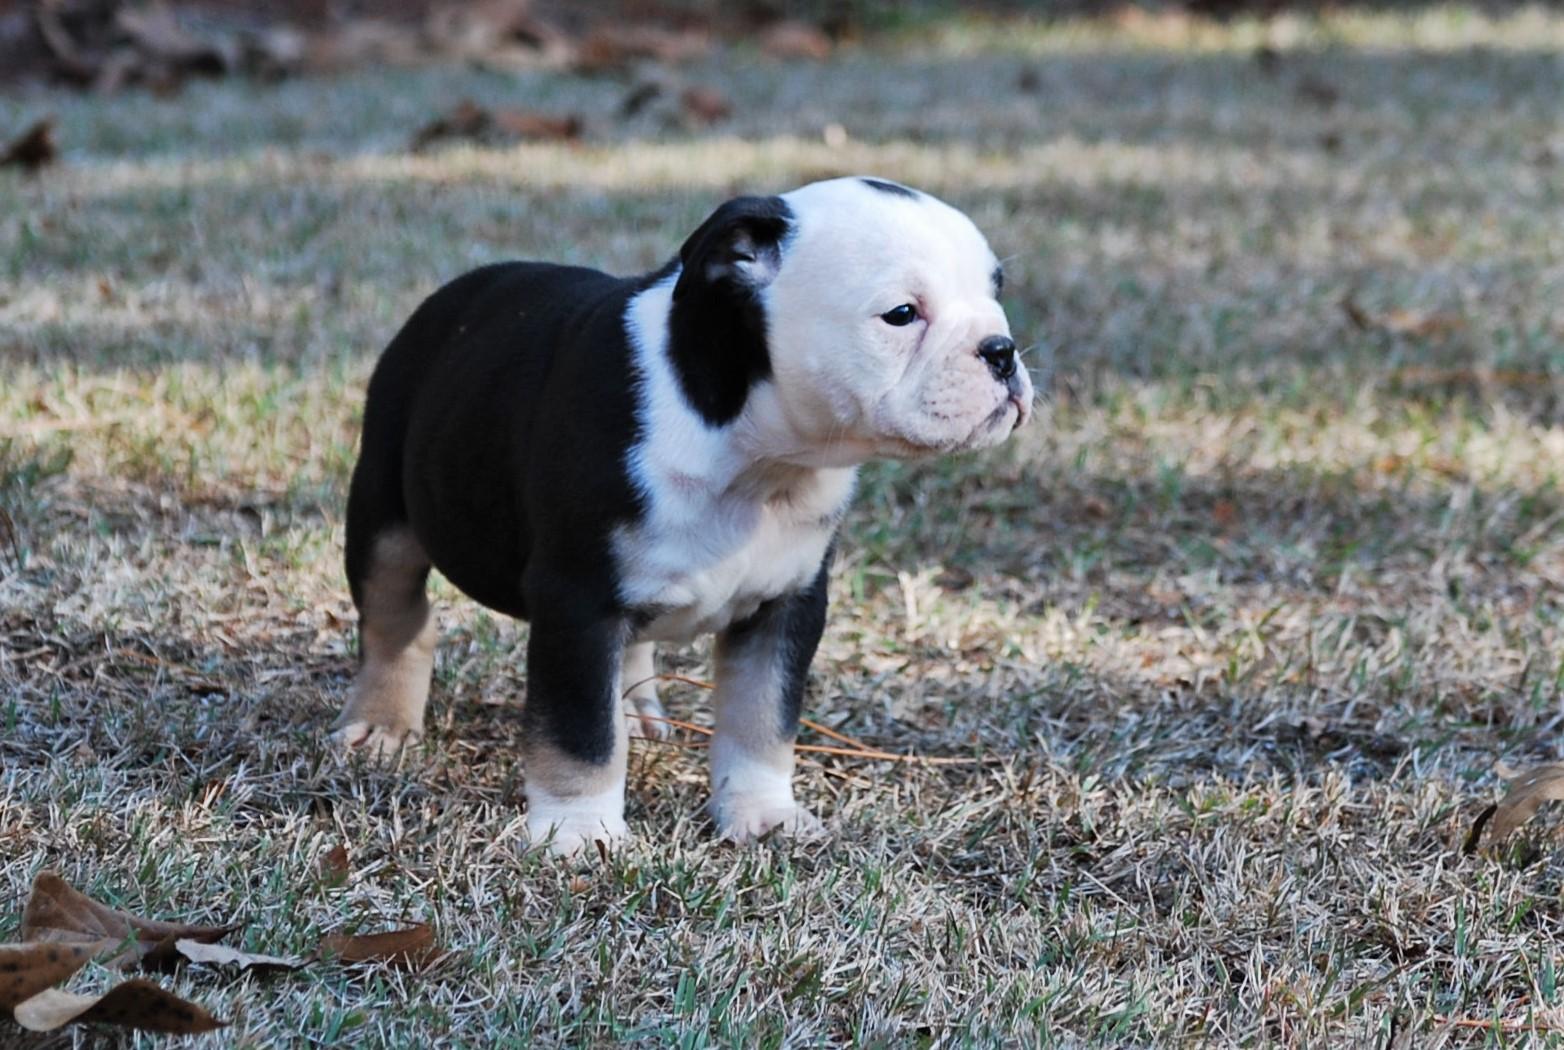 Thunder Olde English Bulldogge Puppy For Sale | Photo 2